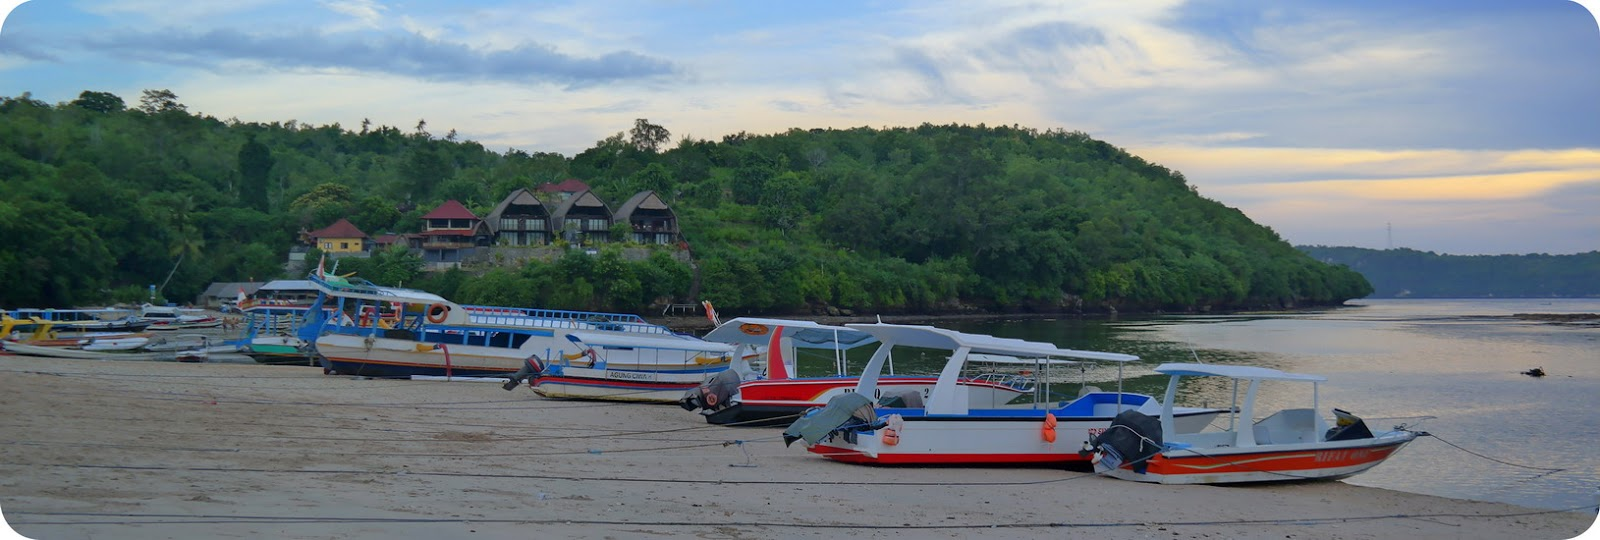 Blog Indonesia Page 3831 Of 3841 Tcash Vaganza 17 Samsung Adaptor Fast Charging Kualitas Original Putih Pelabuhan Nusa Penida